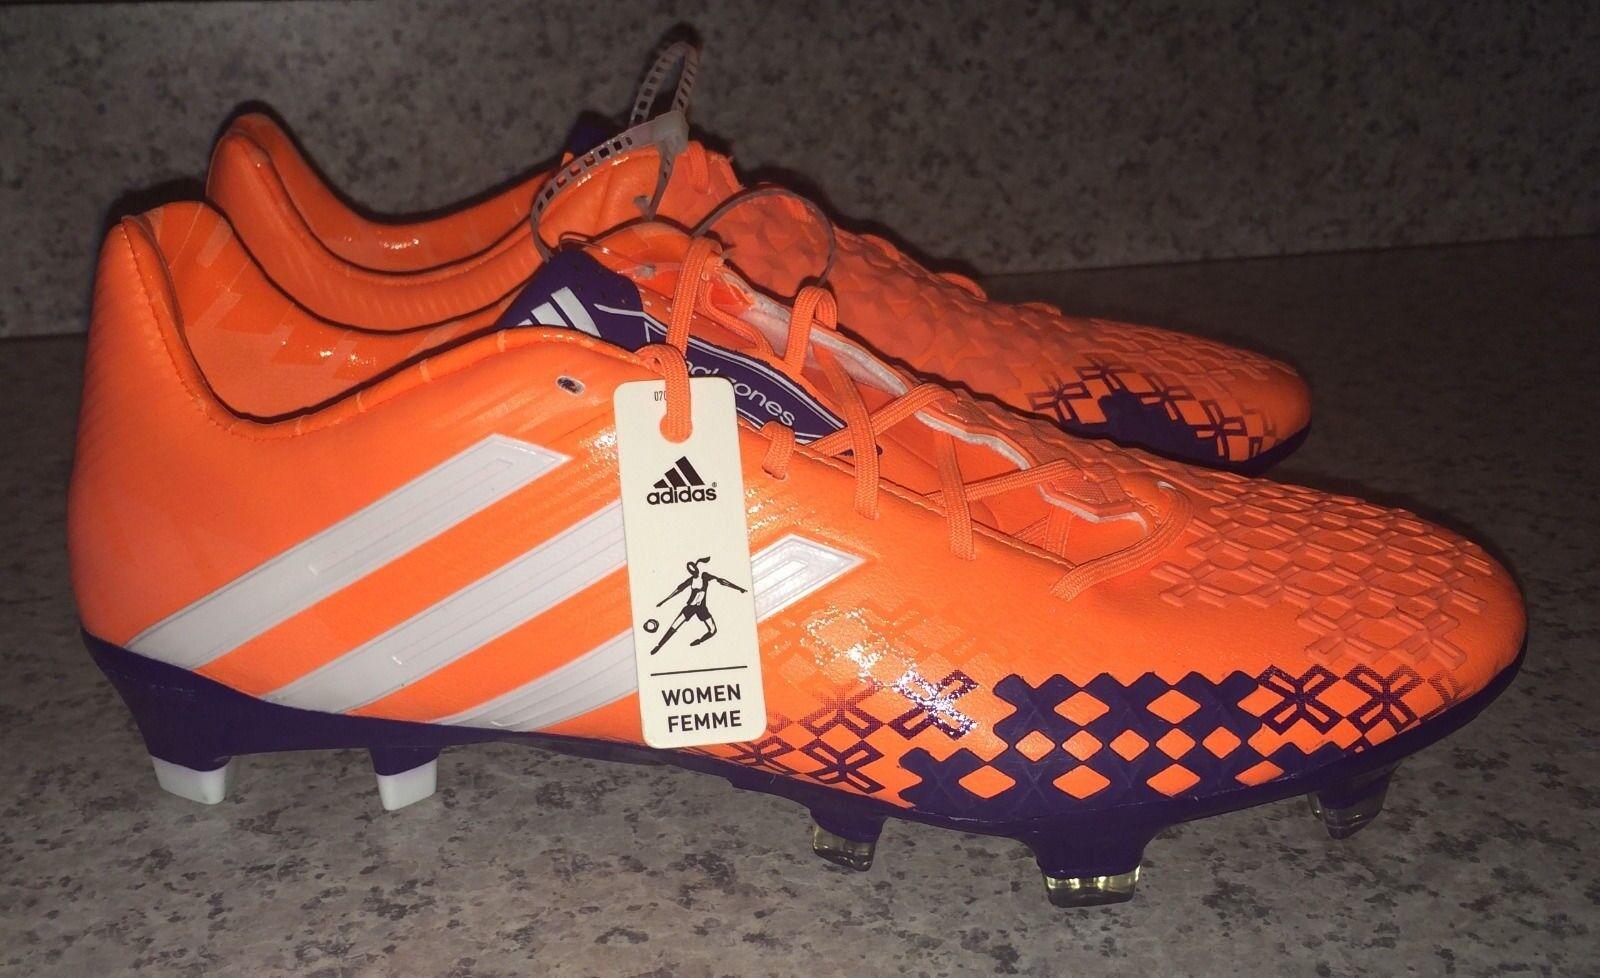 ADIDAS Predator LZ TRX FG orange orange orange Purple Soccer Cleats Boots NEW Womens Sz 5 5a064c